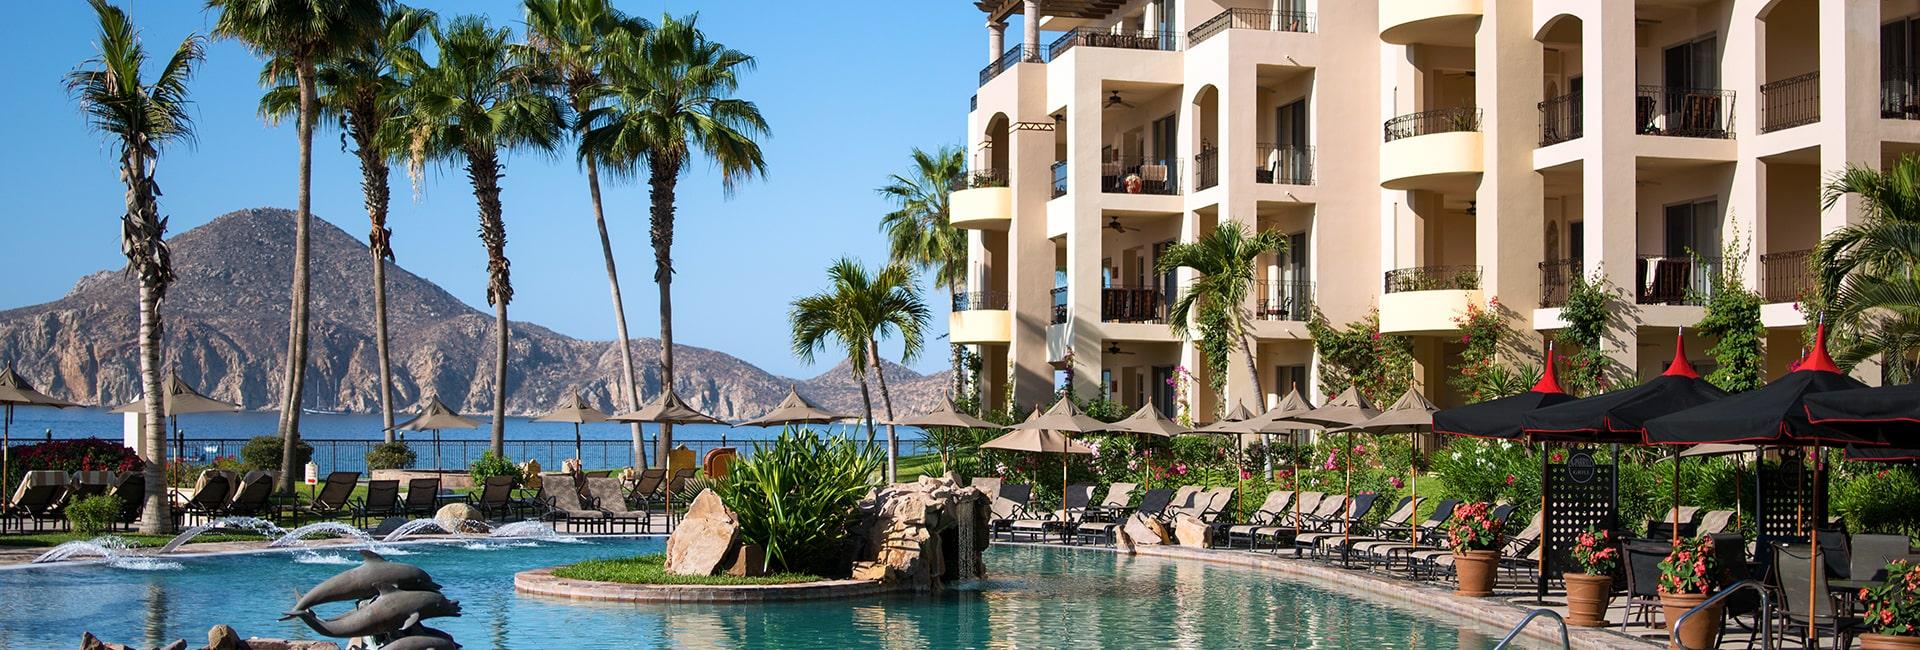 Villa la estancia cabo wins tripadvisor travellers choice awards 2020